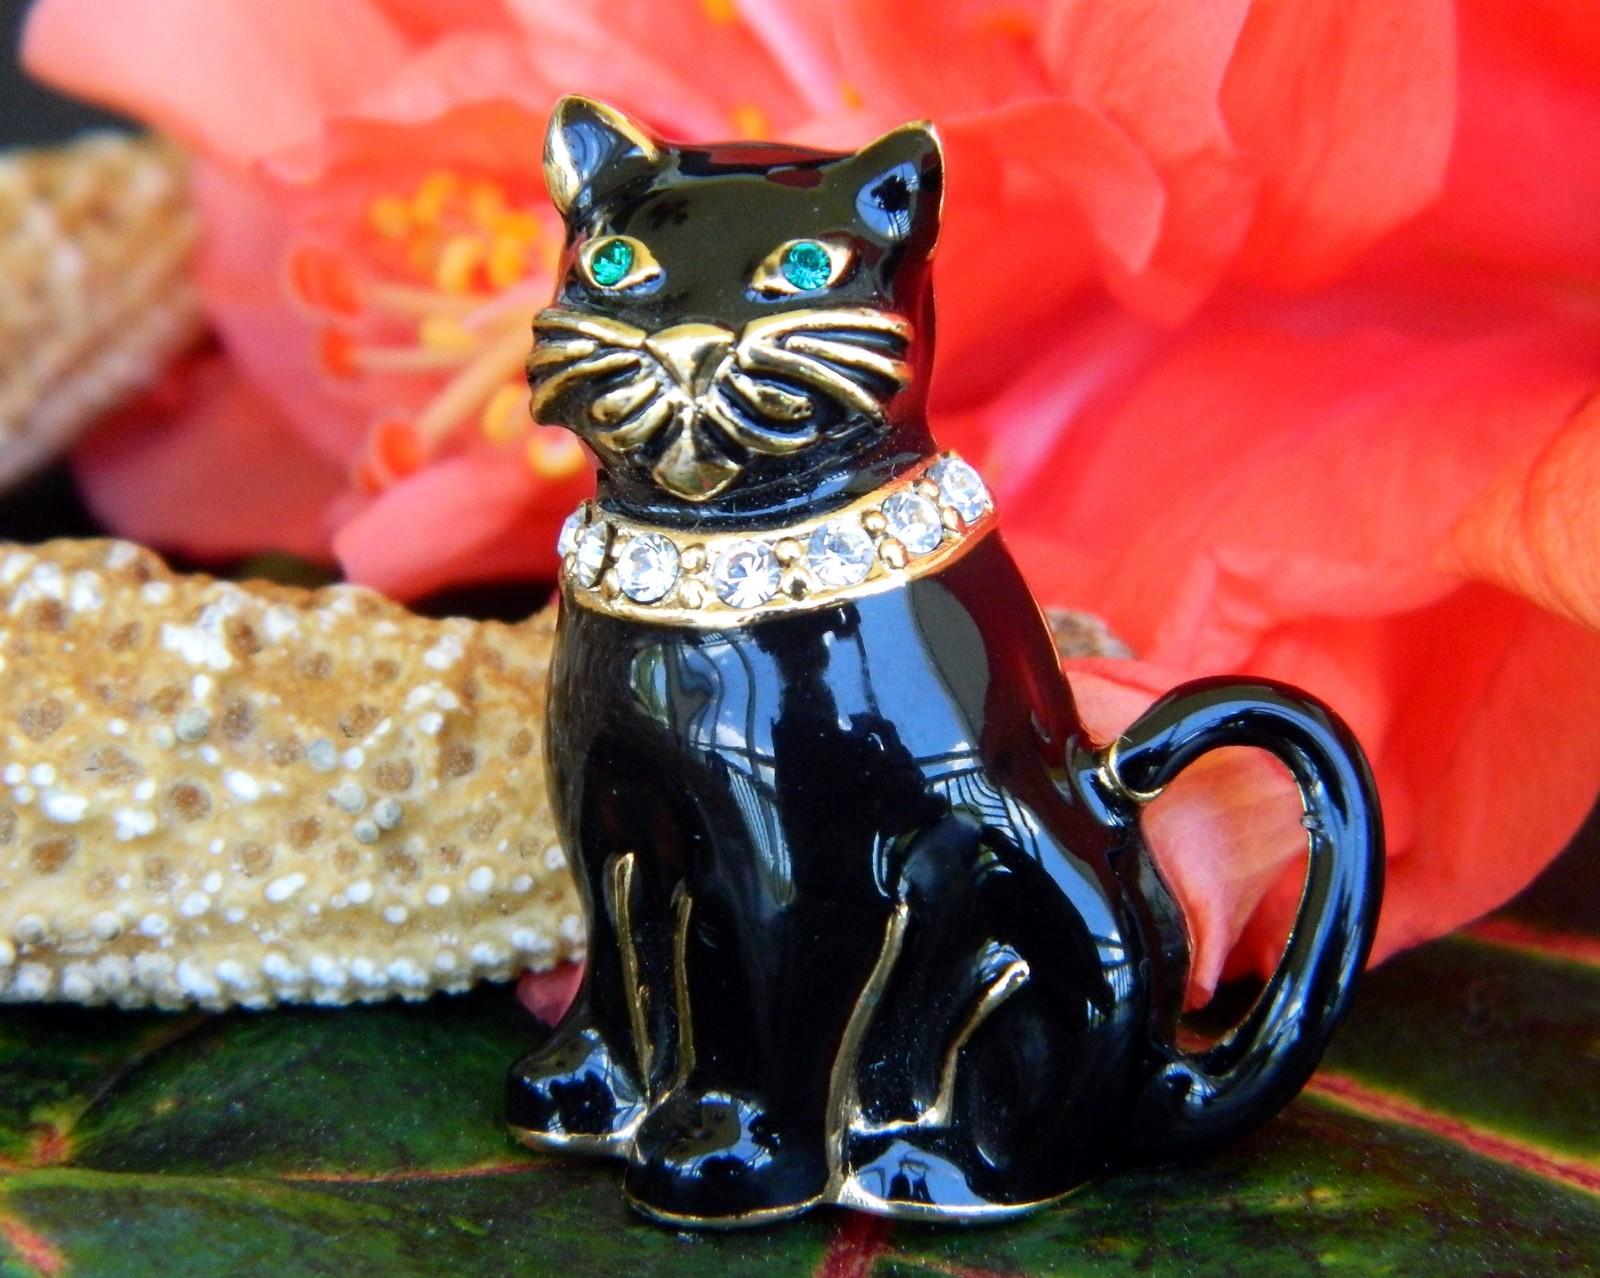 Vintage Monet Black Cat Brooch Pin Enamel Rhinestones Collar Figural image 7